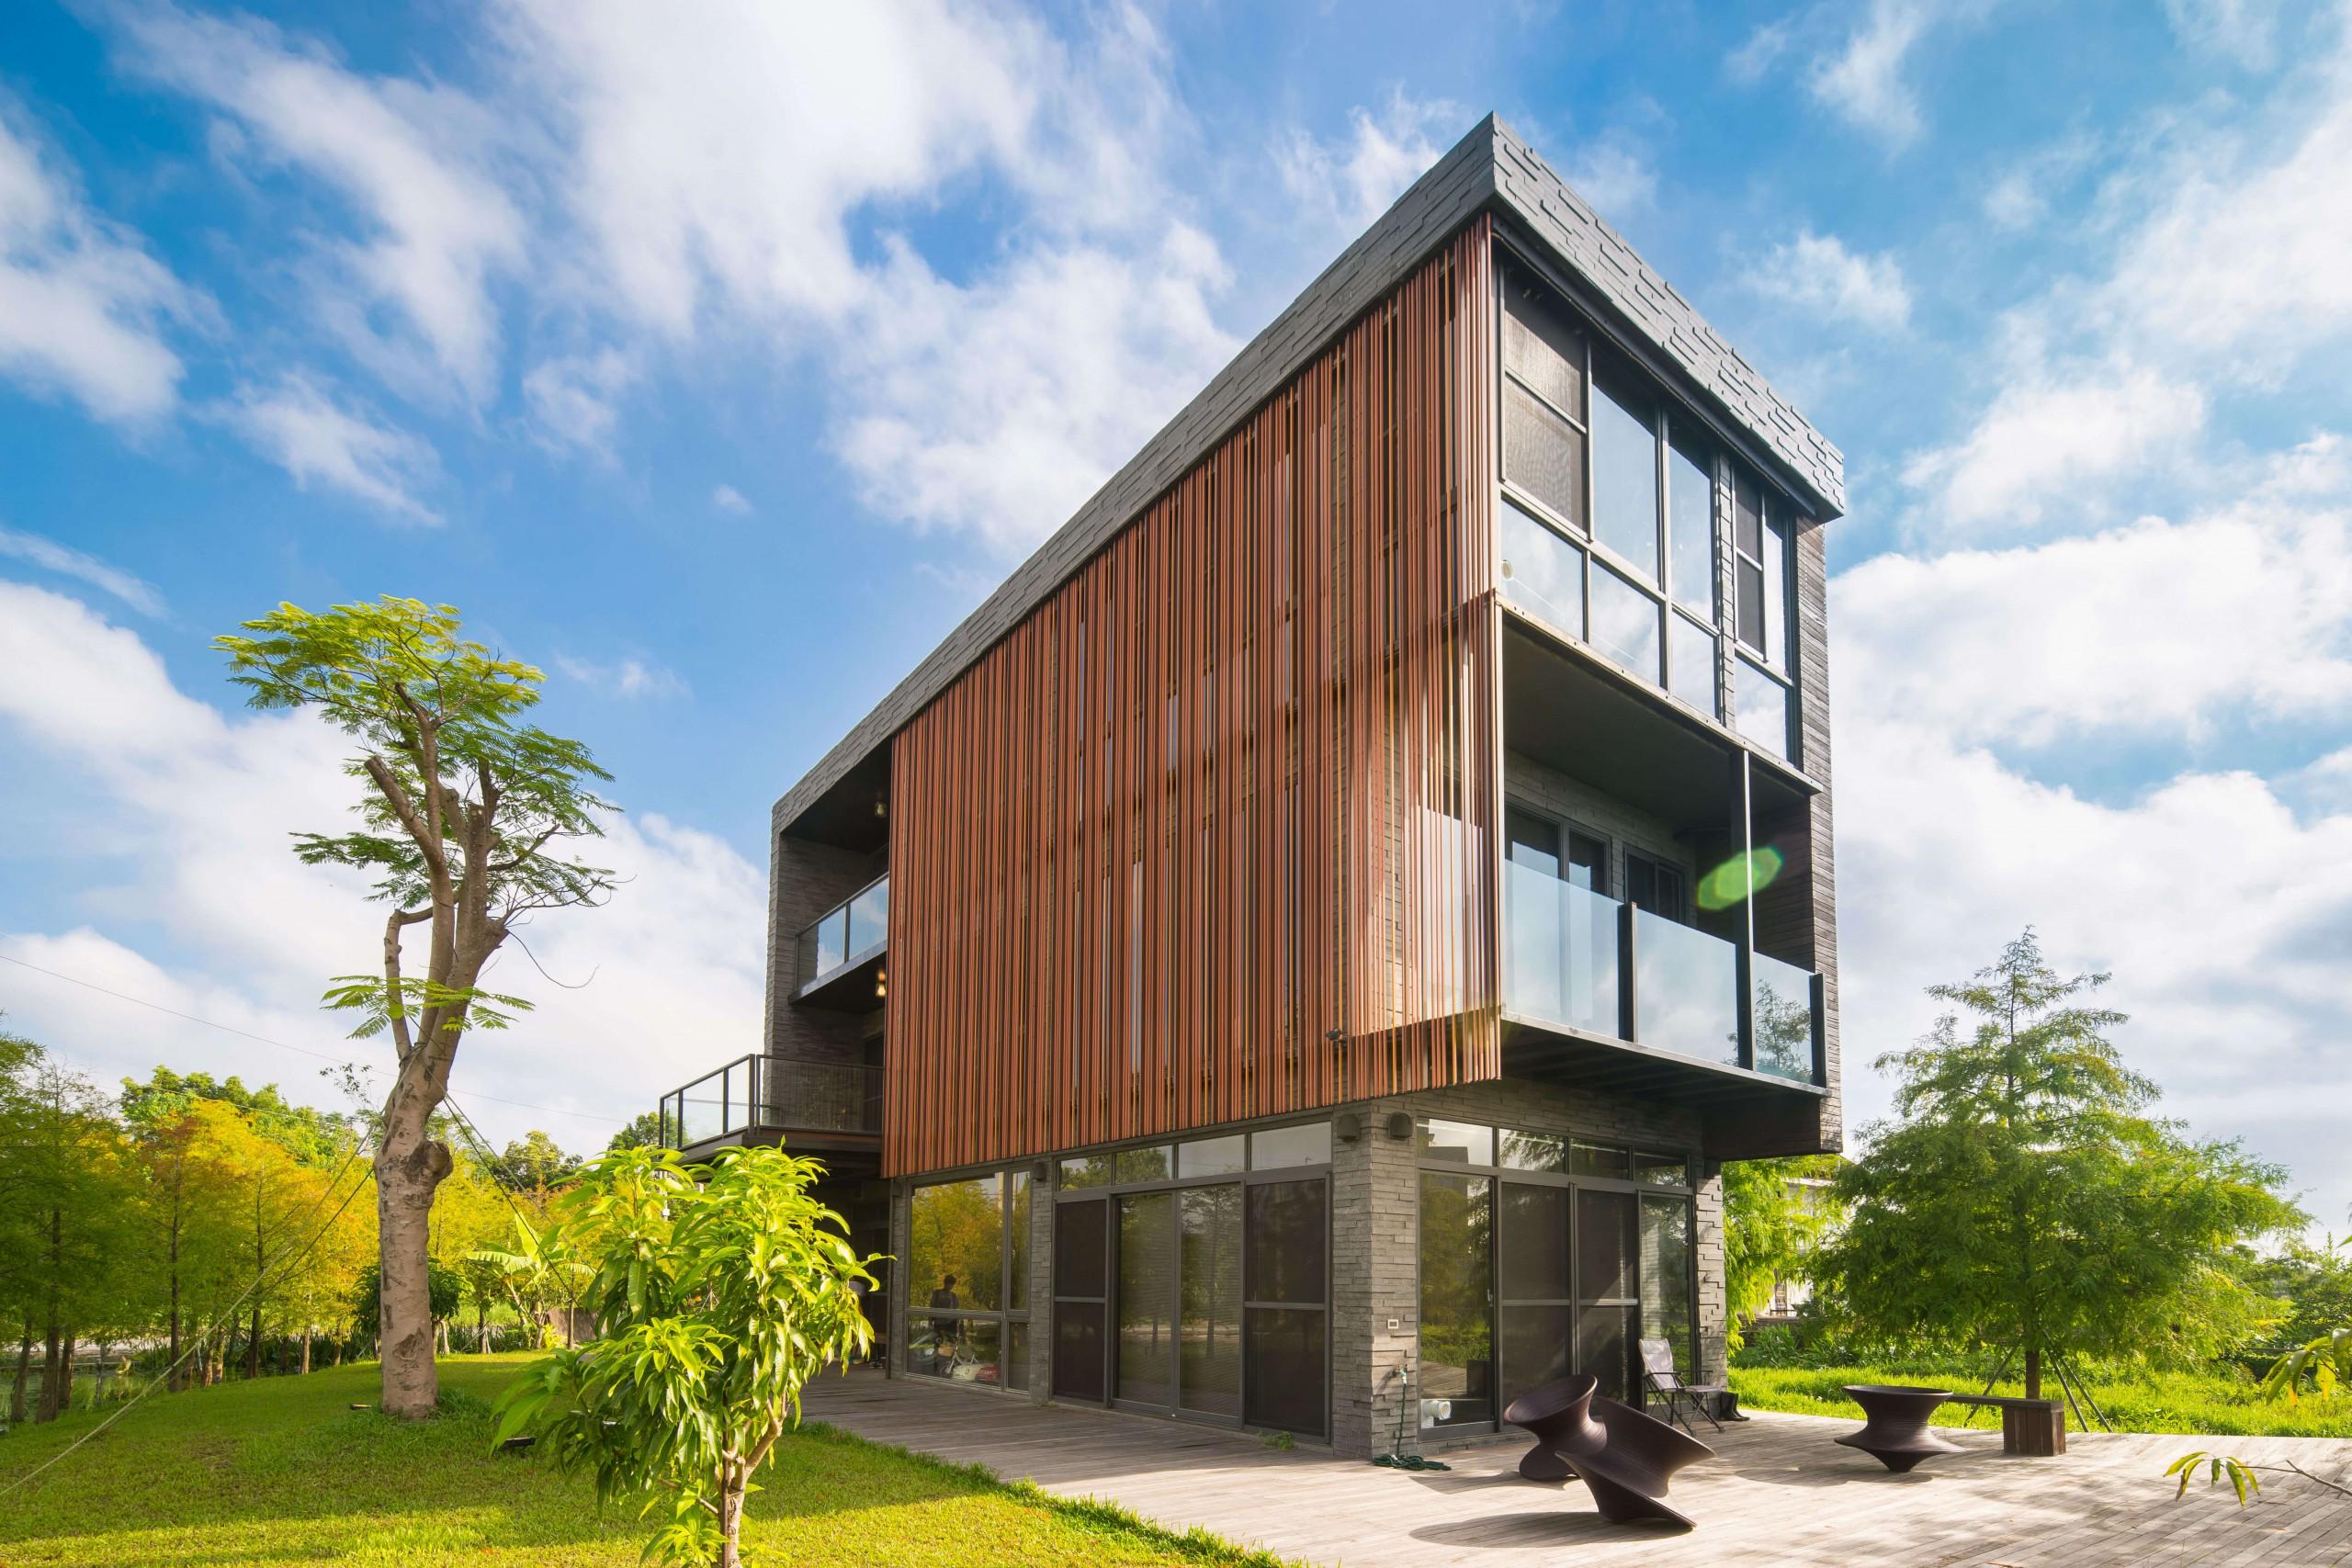 德築-DEZU-project-HAHouse秋-architecture-building-landscape-4 2